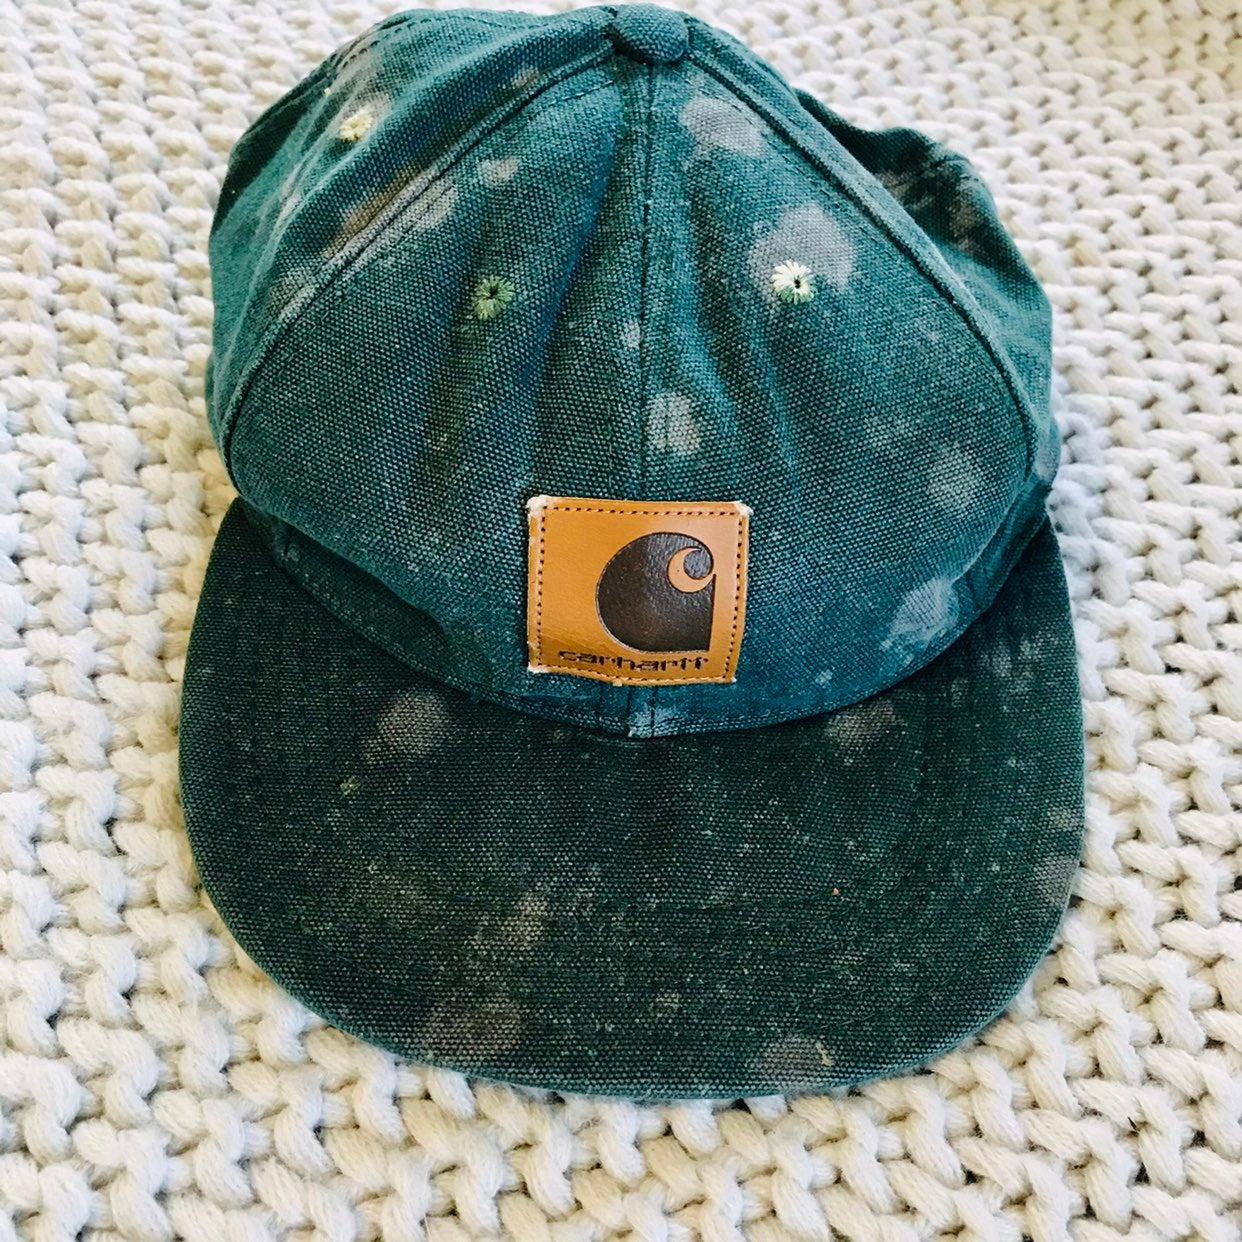 Carhartt vintage teal hat